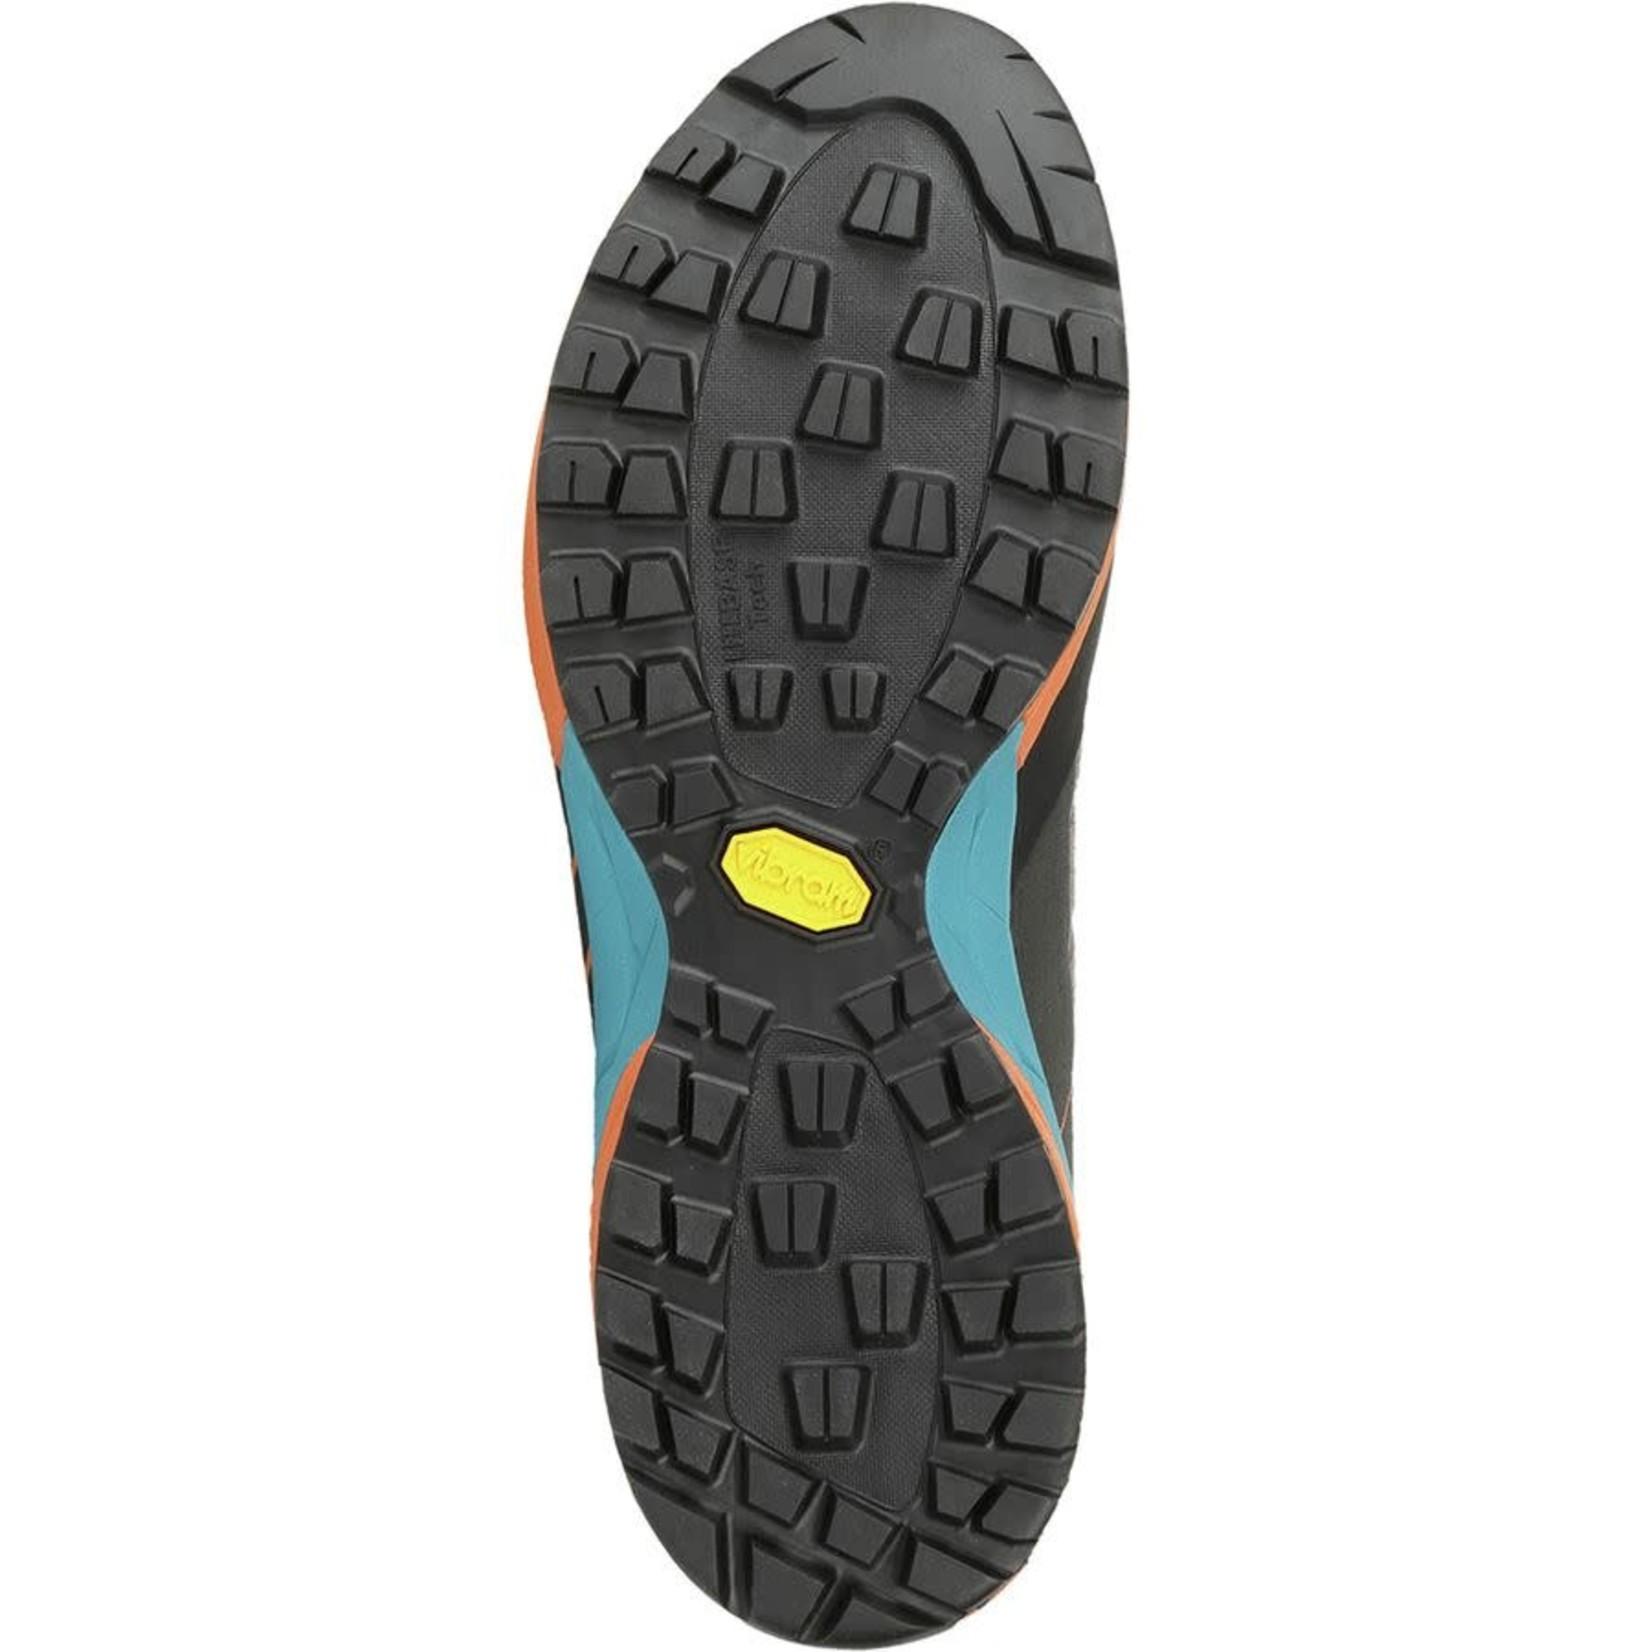 Scarpa Chaussure d'approche  Scarpa Mescalito - Homme